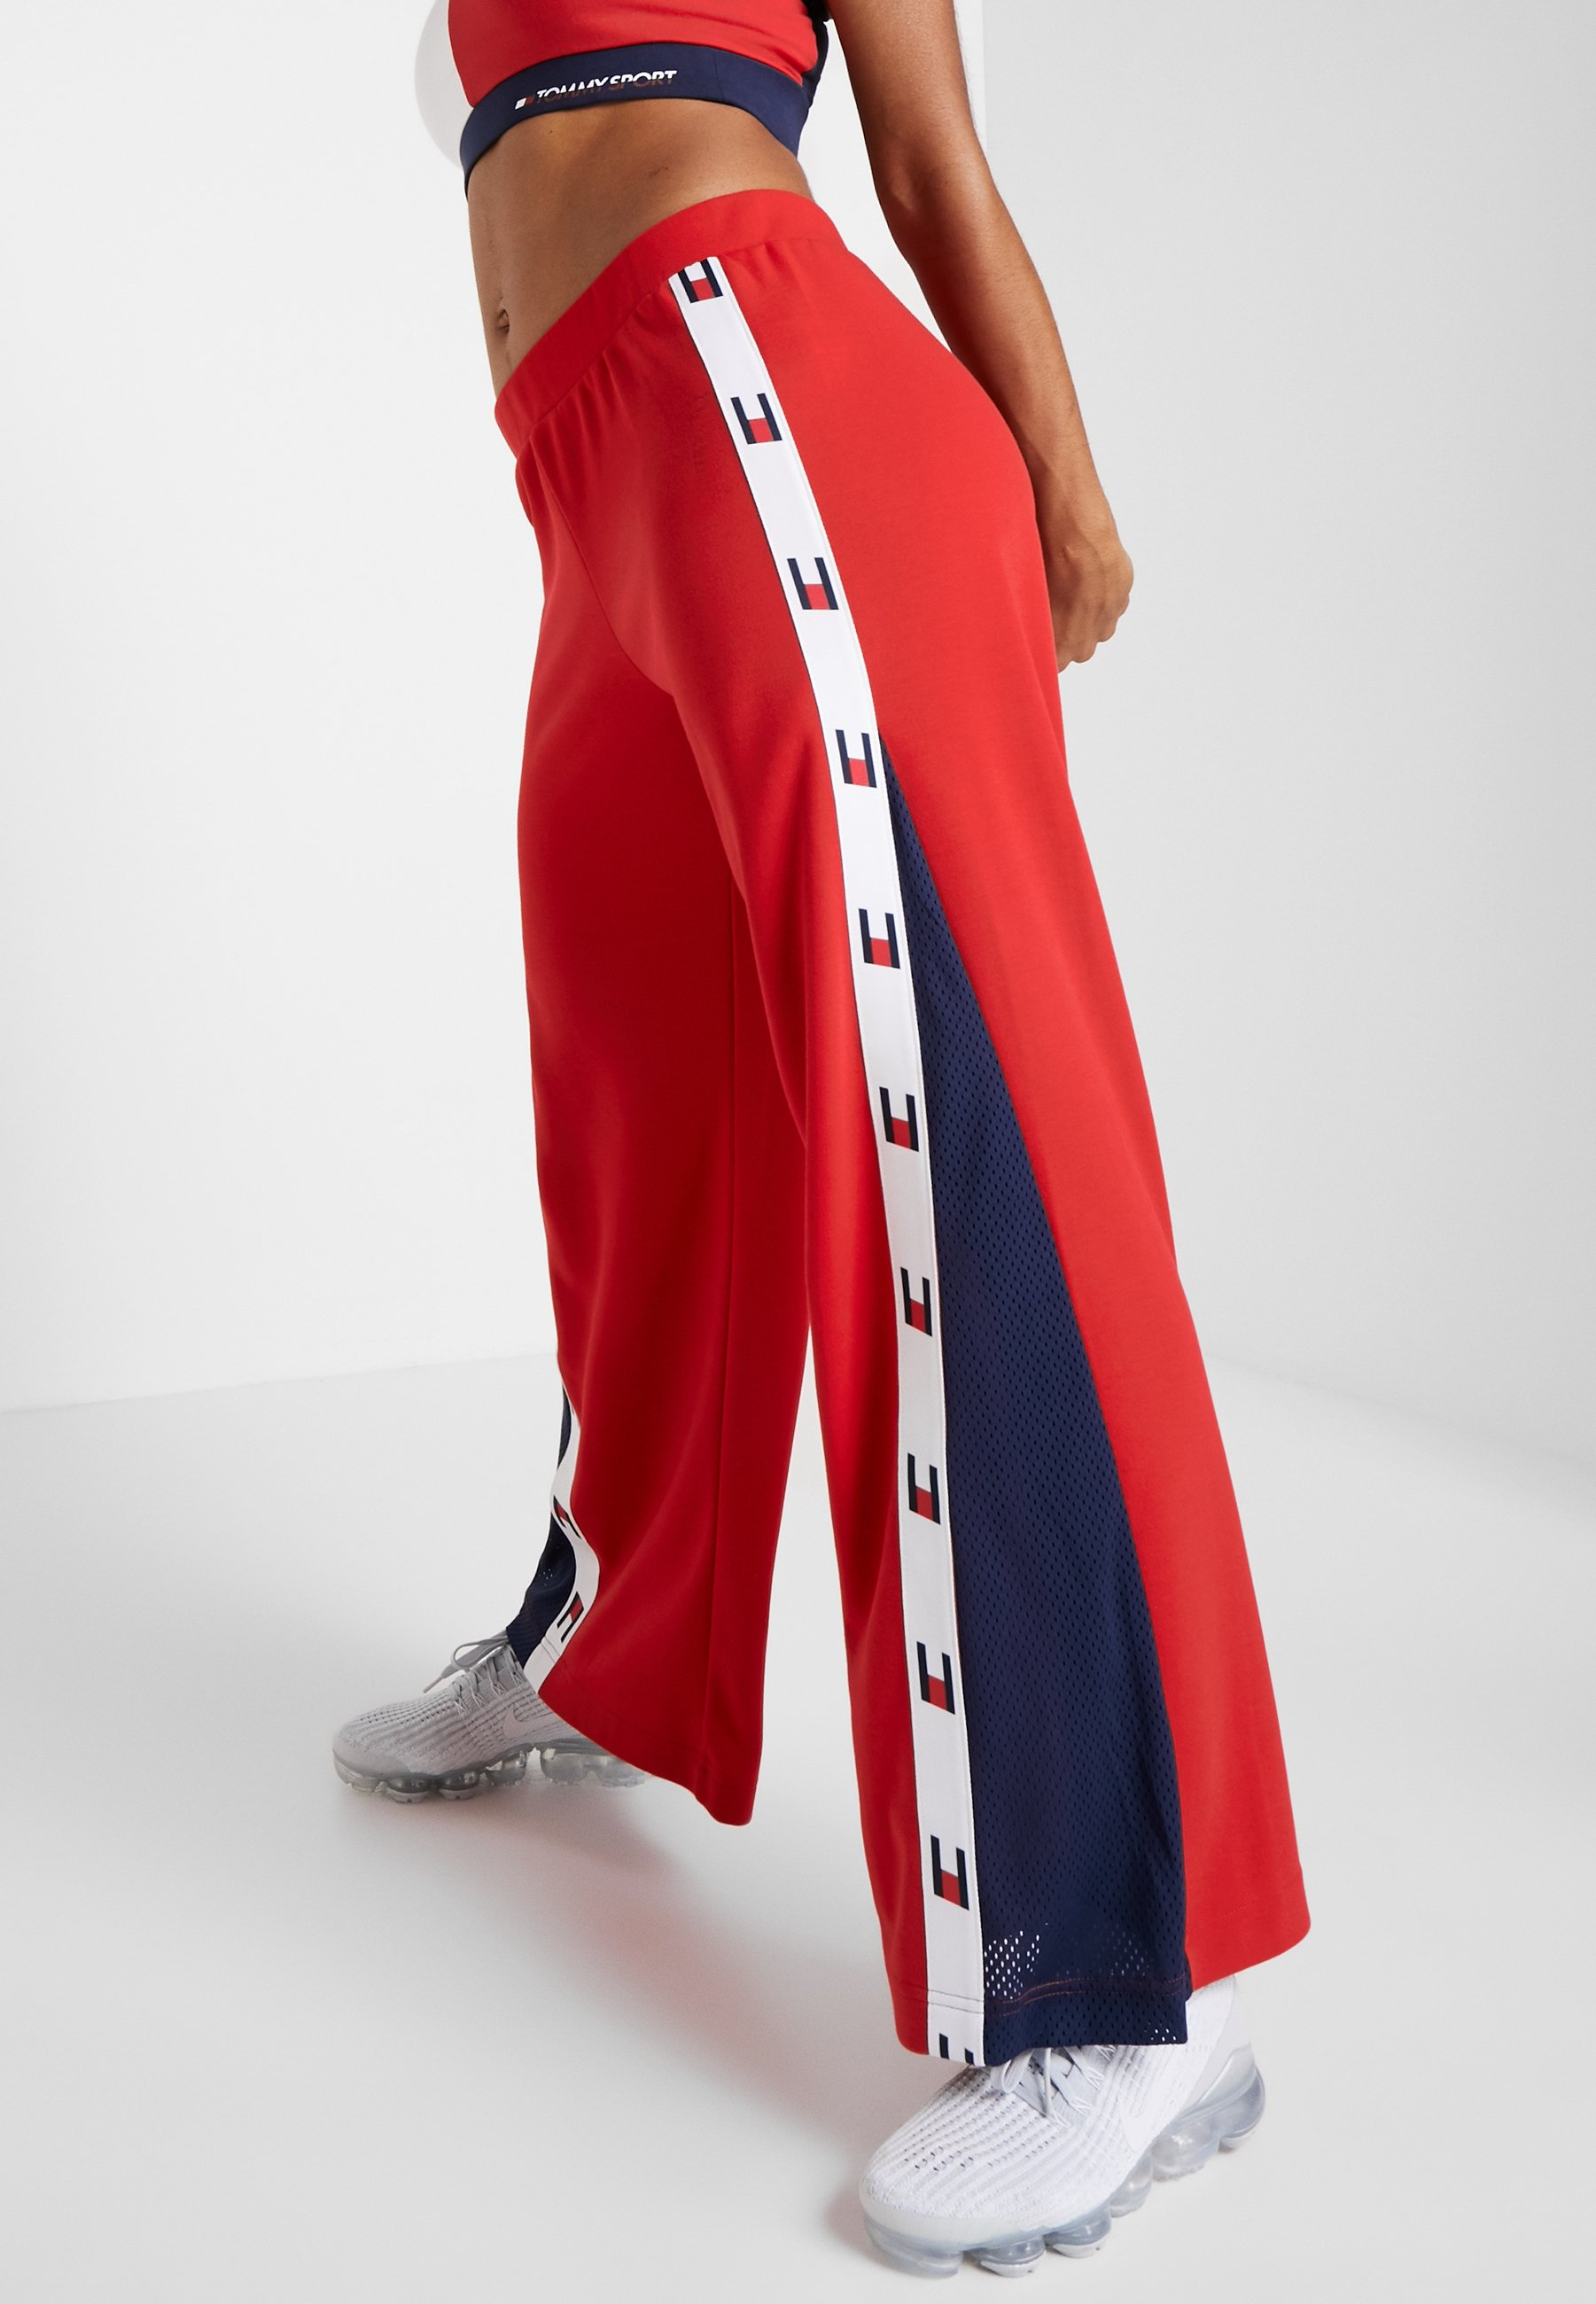 Flag De FlarePantalon Pant Survêtement Red Tommy Tape Sport zLGSUpqMV